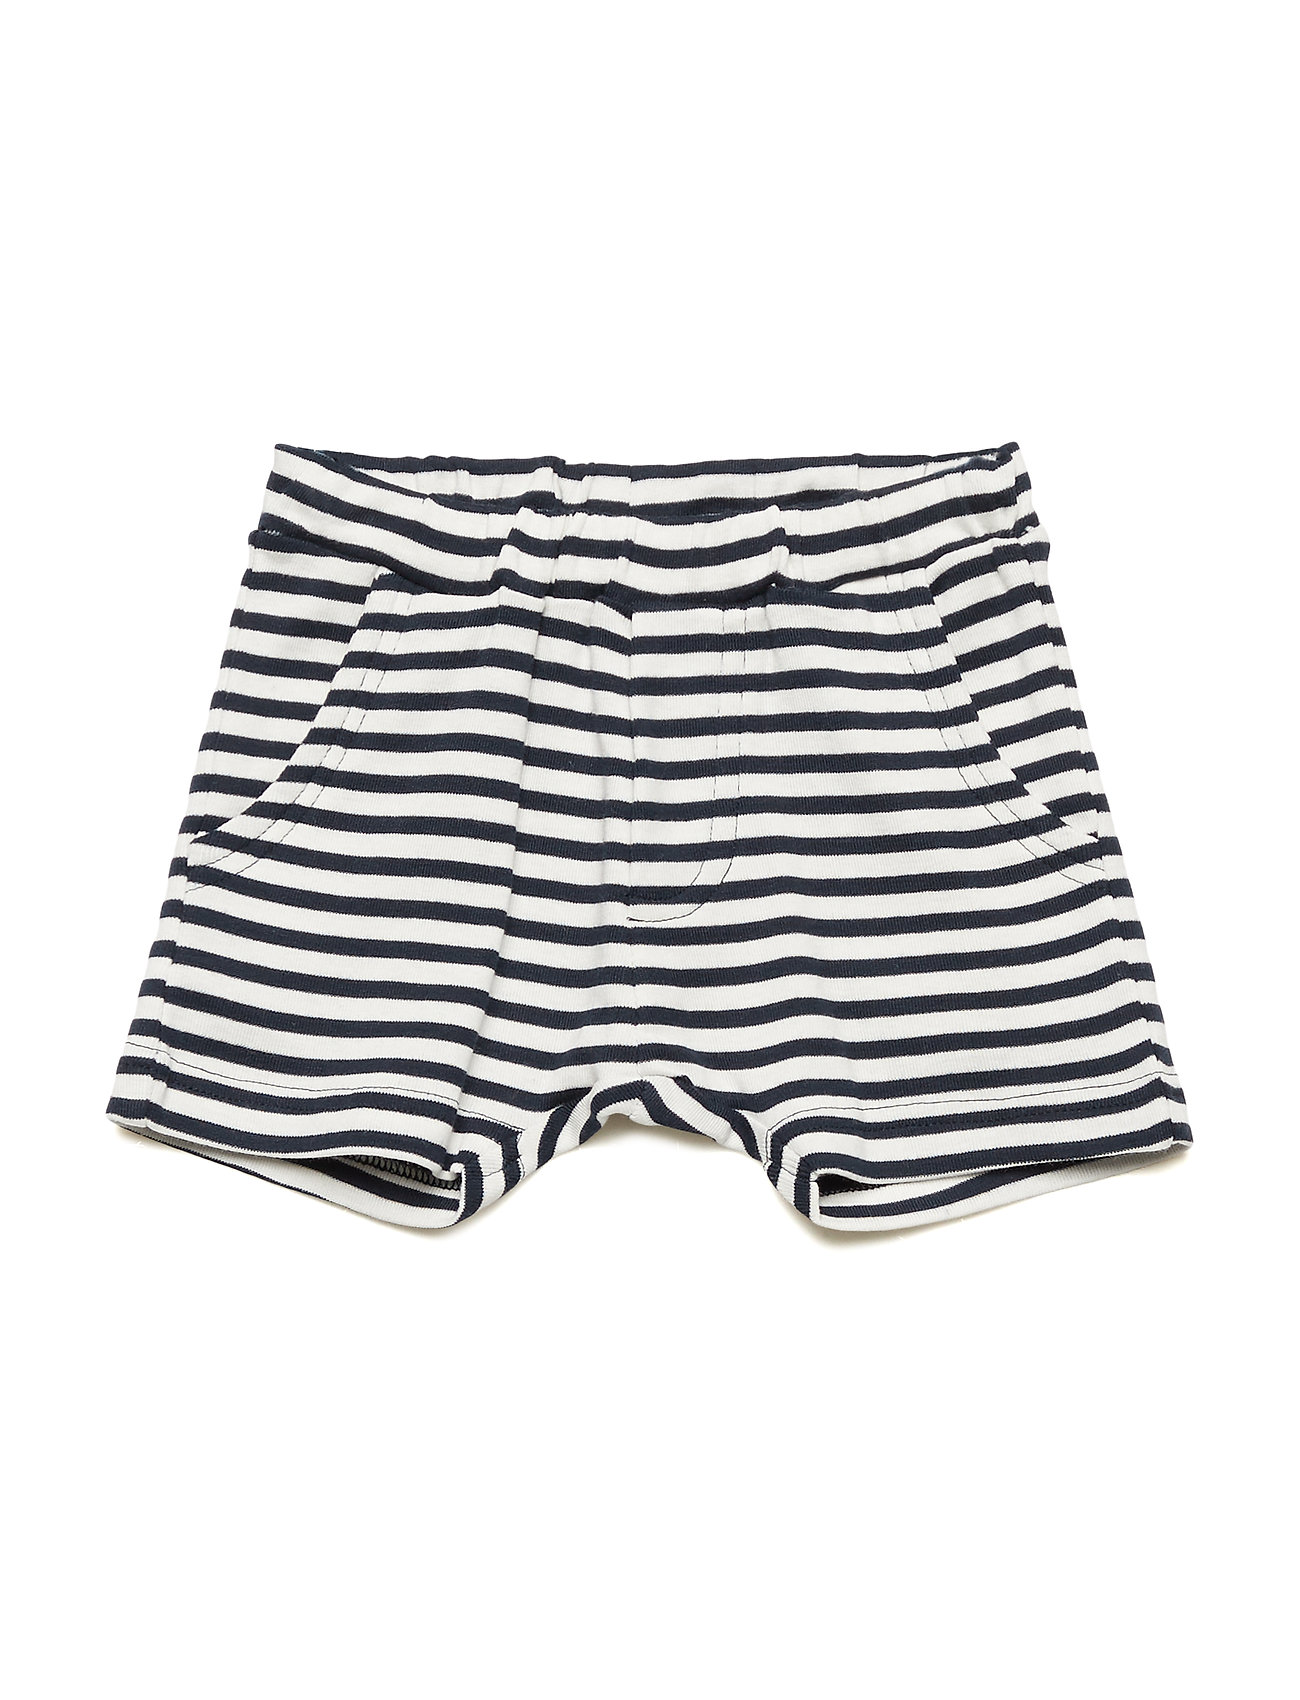 Wheat Shorts Aske - NAVY